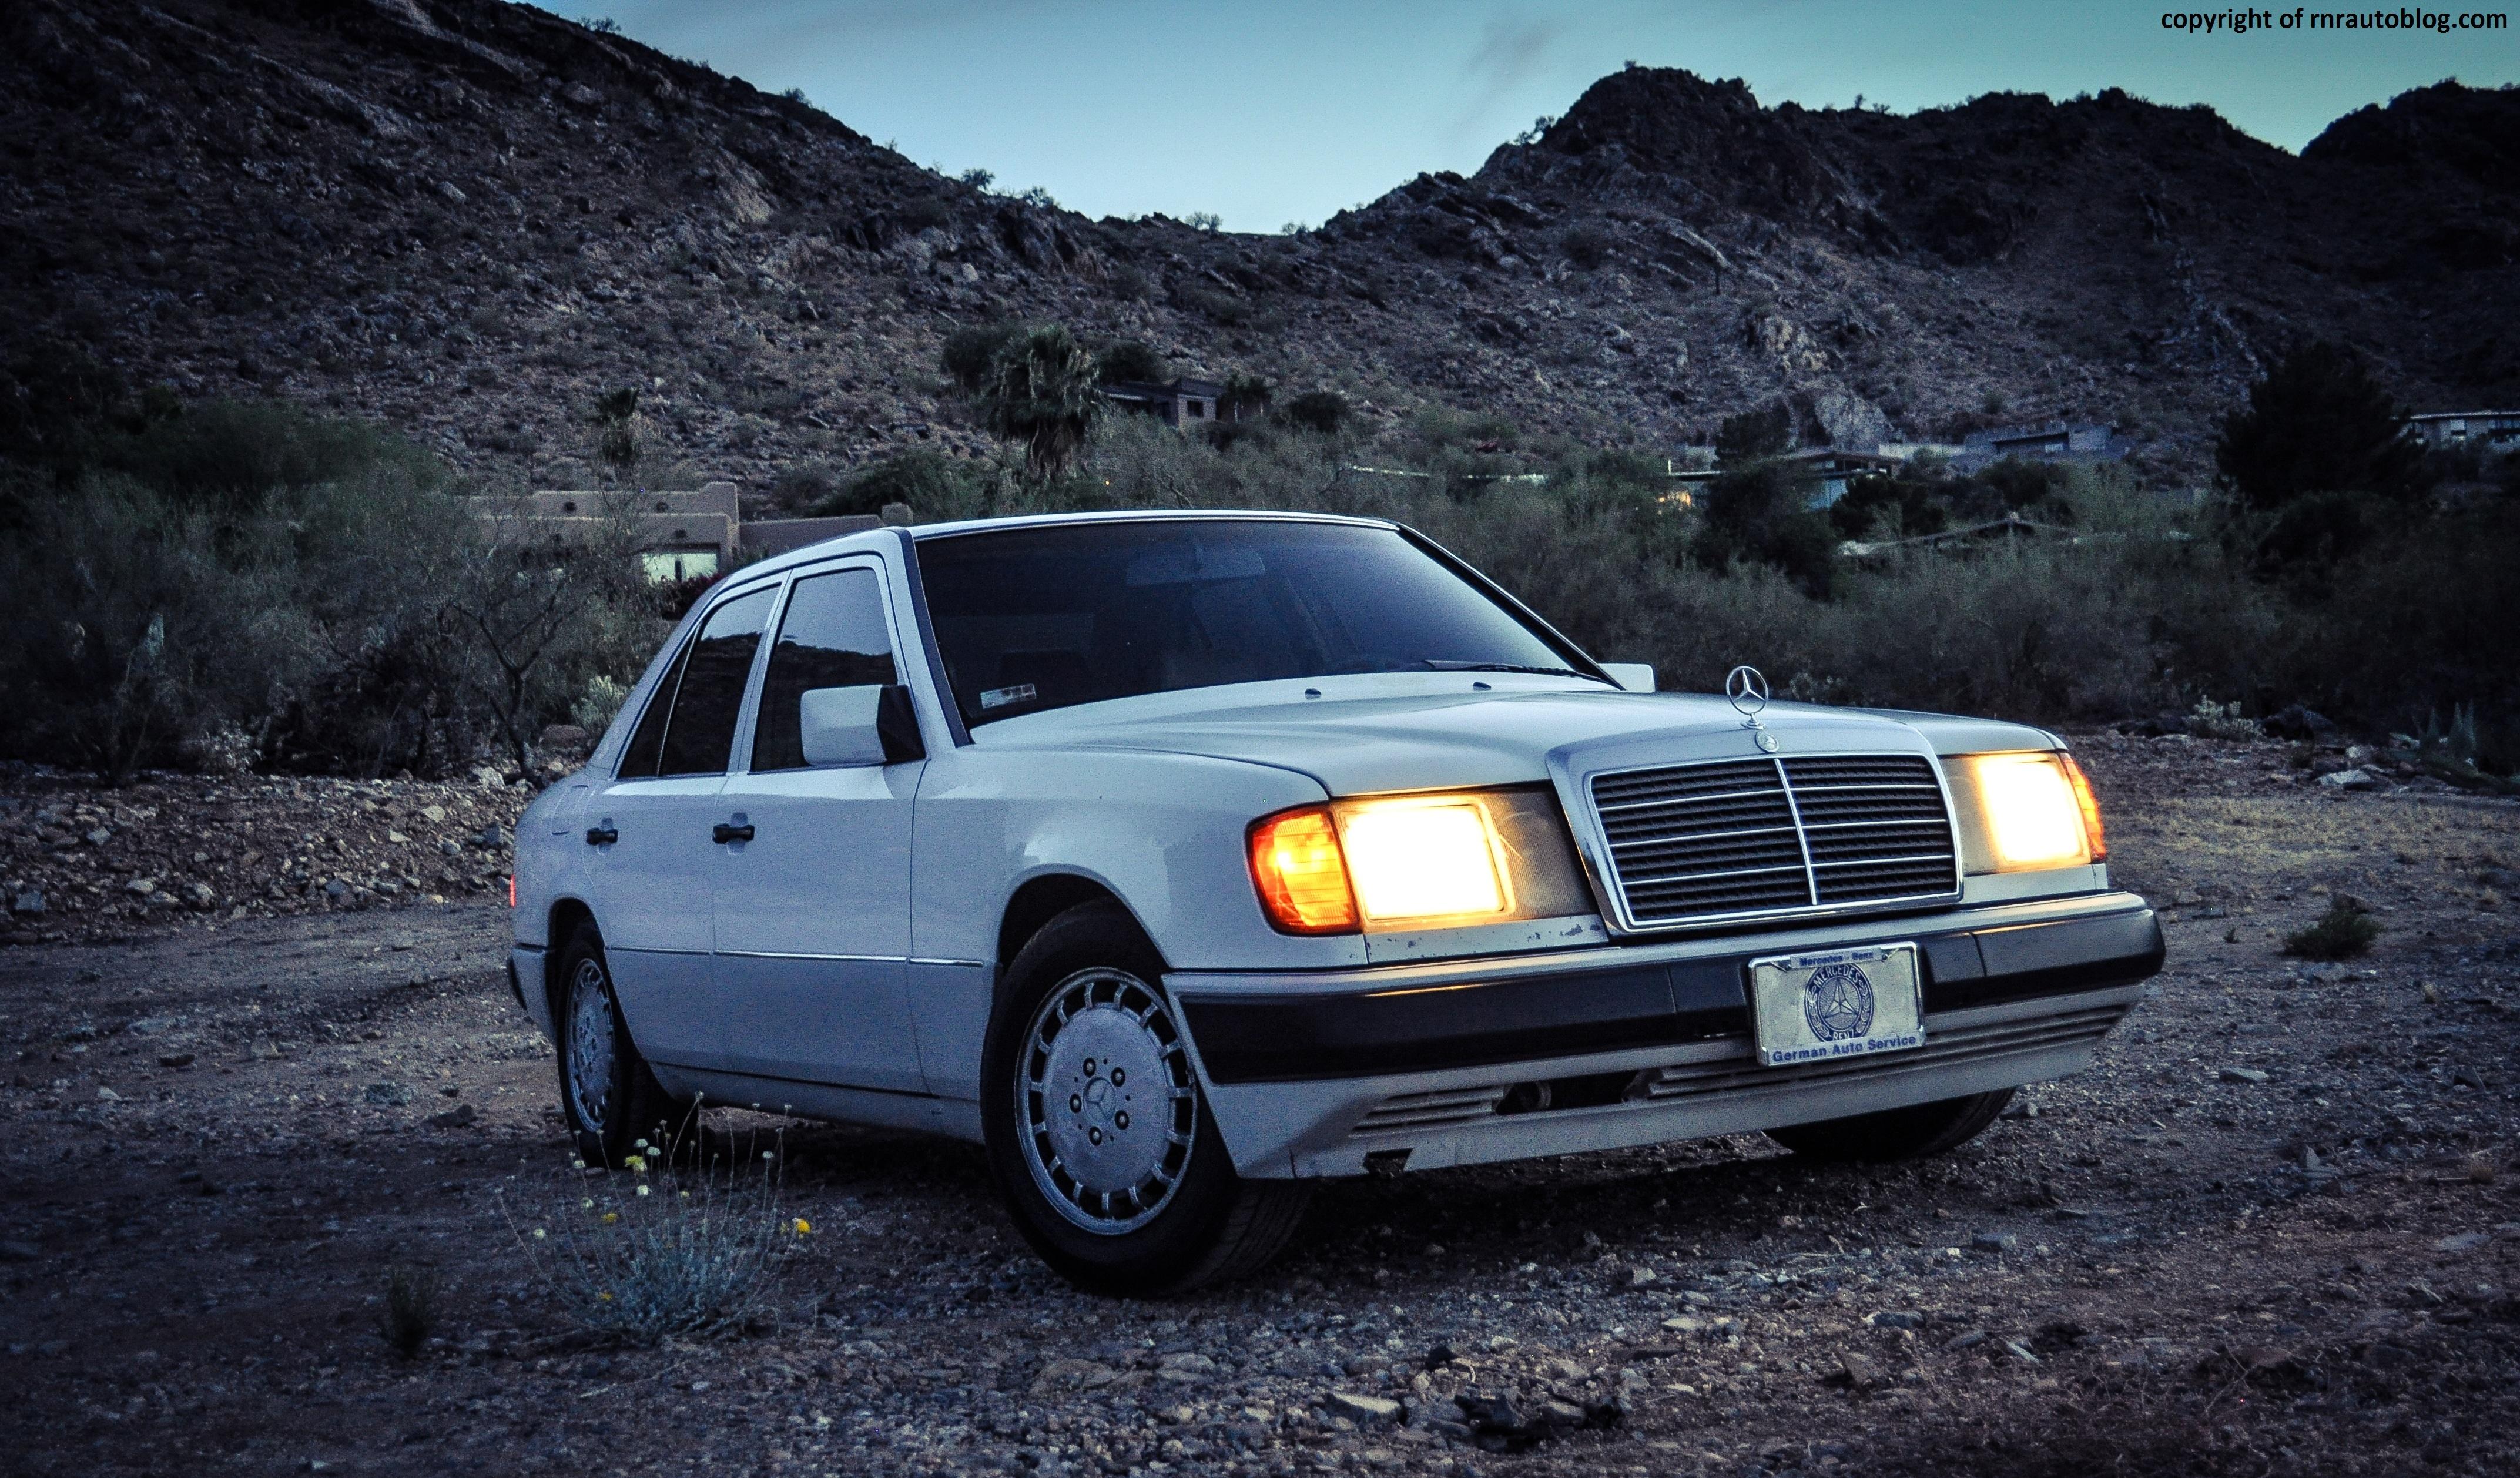 1990 Mercedes-Benz 300E 2.6 Review | RNR Automotive Blog